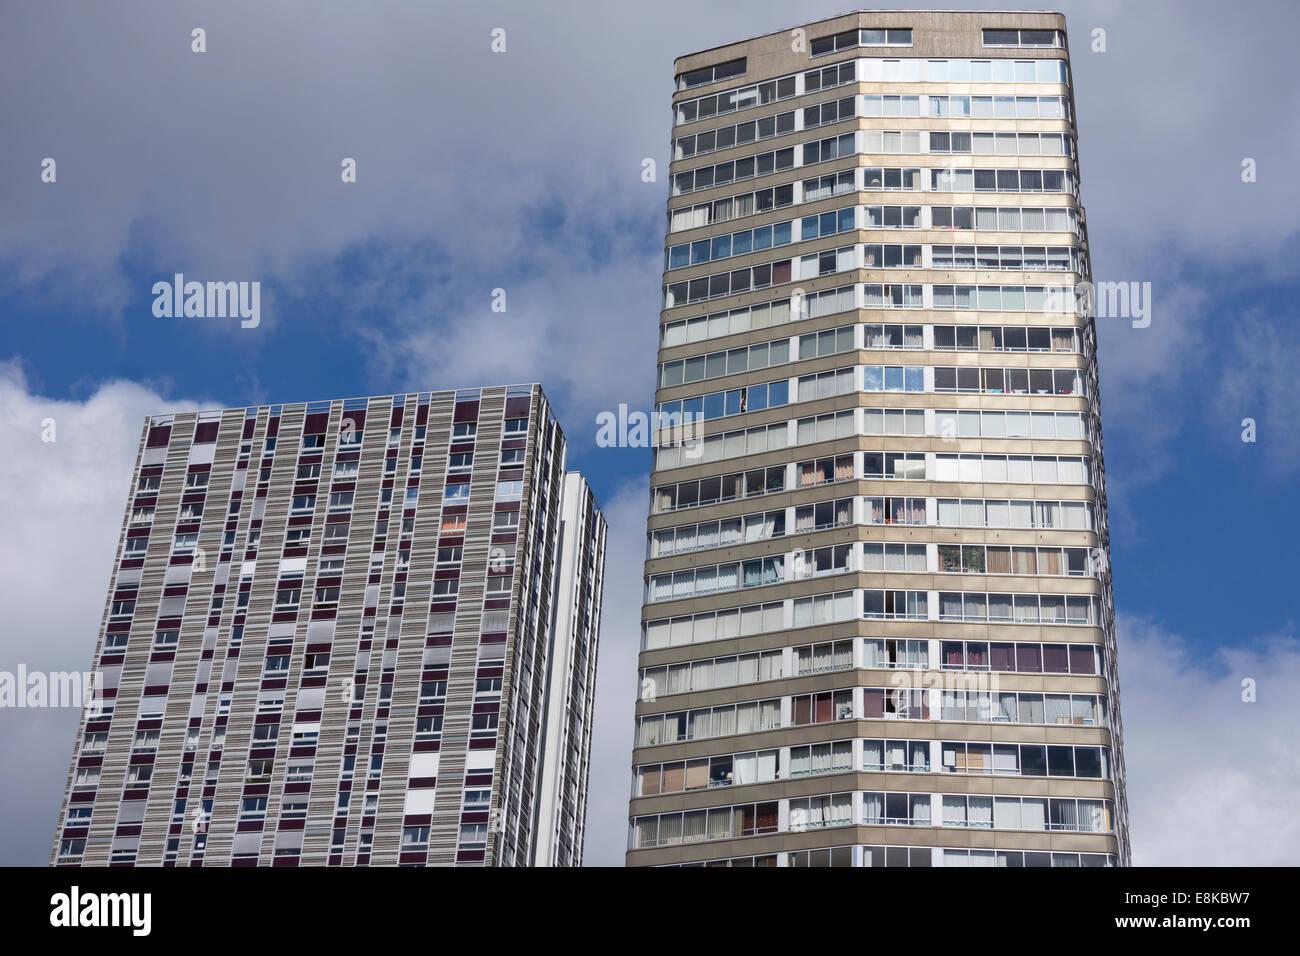 Facade Of Modern Apartment Buildings In Paris, France